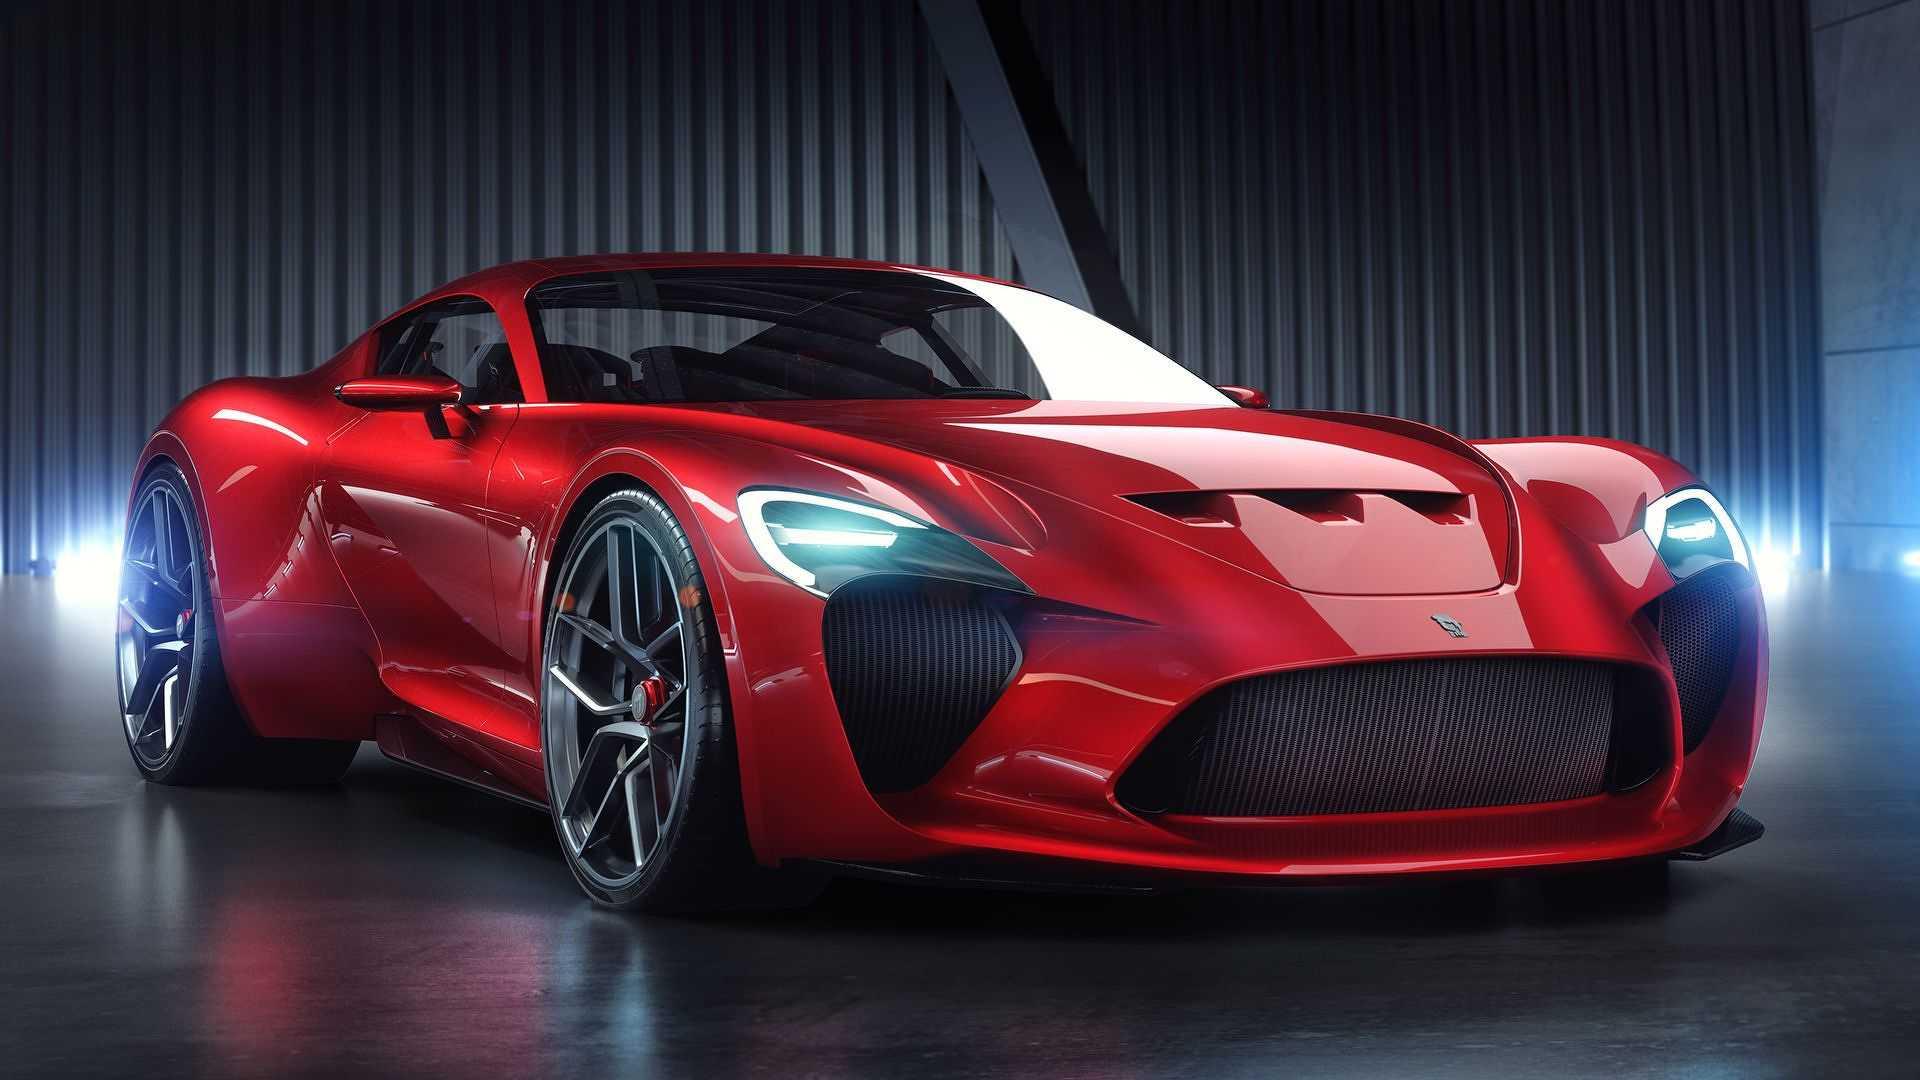 10 Most Popular Concept Car Renderings Of 2017 (So Far)